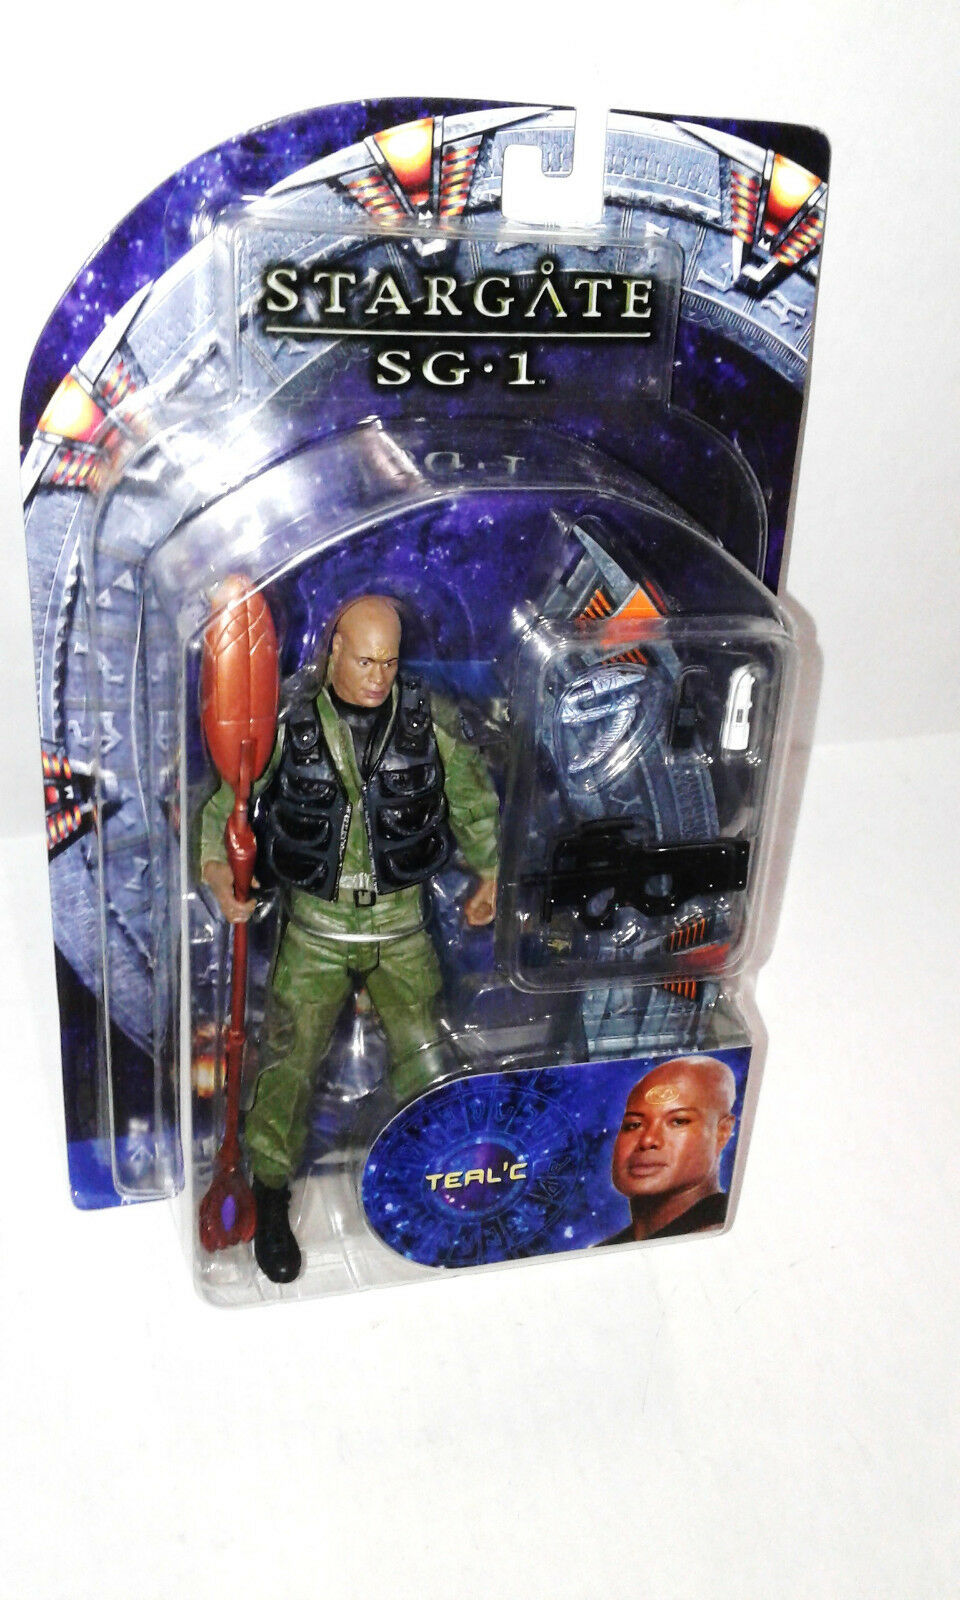 2006 Diamond Select Series 2 Stargate SG1 Tealc New in Box